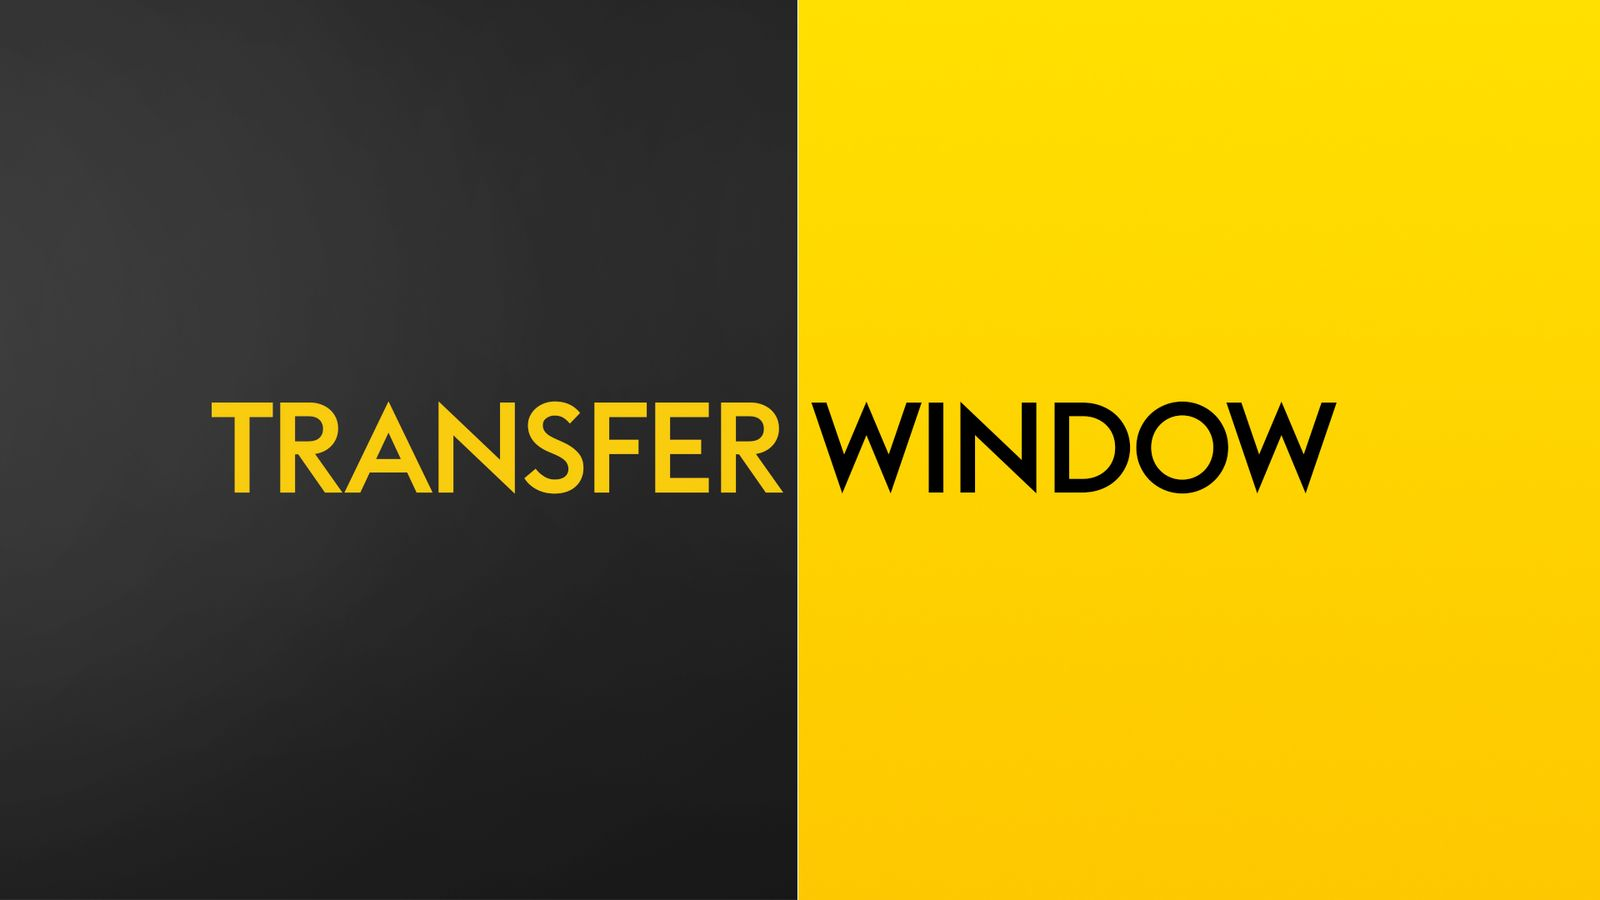 Transfer Deadline Day: When does summer 2019 window close